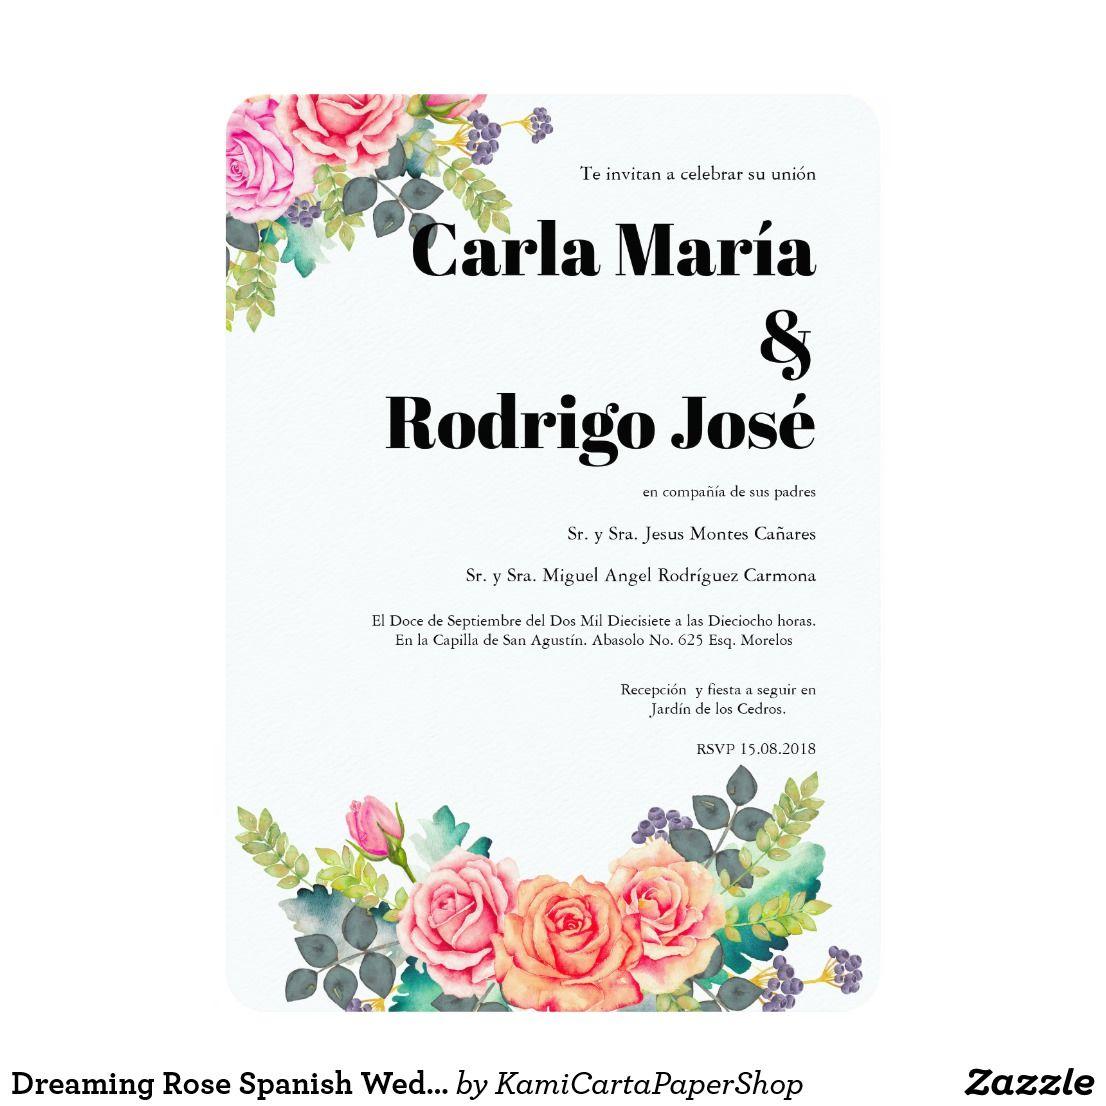 Dreaming rose spanish wedding invitation